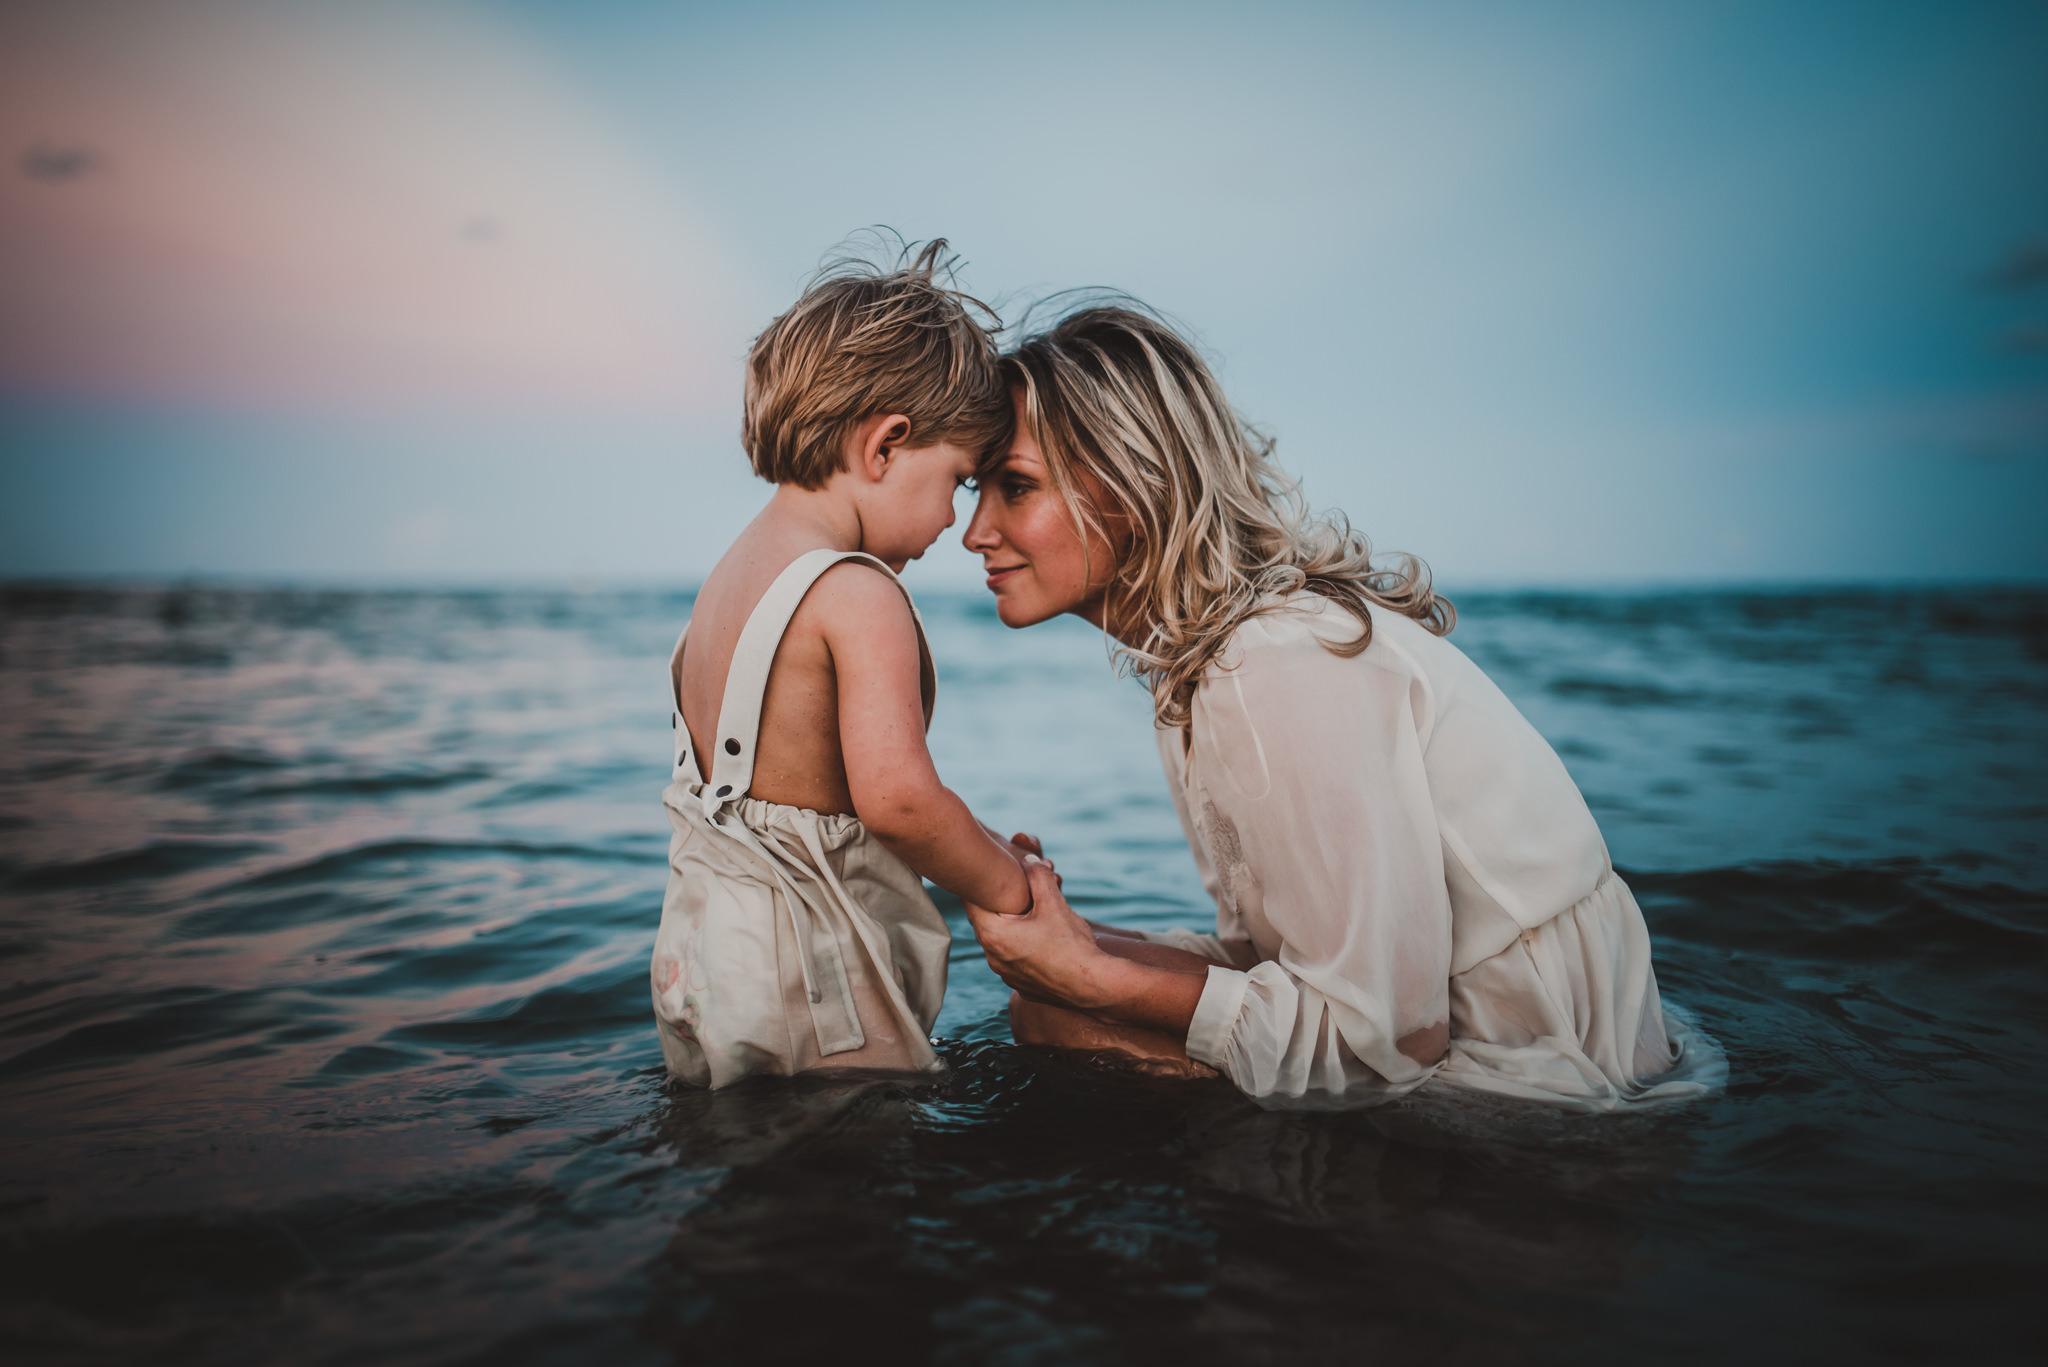 twyla jones photography - treasure coast florida - mother son at the beach--57.jpg